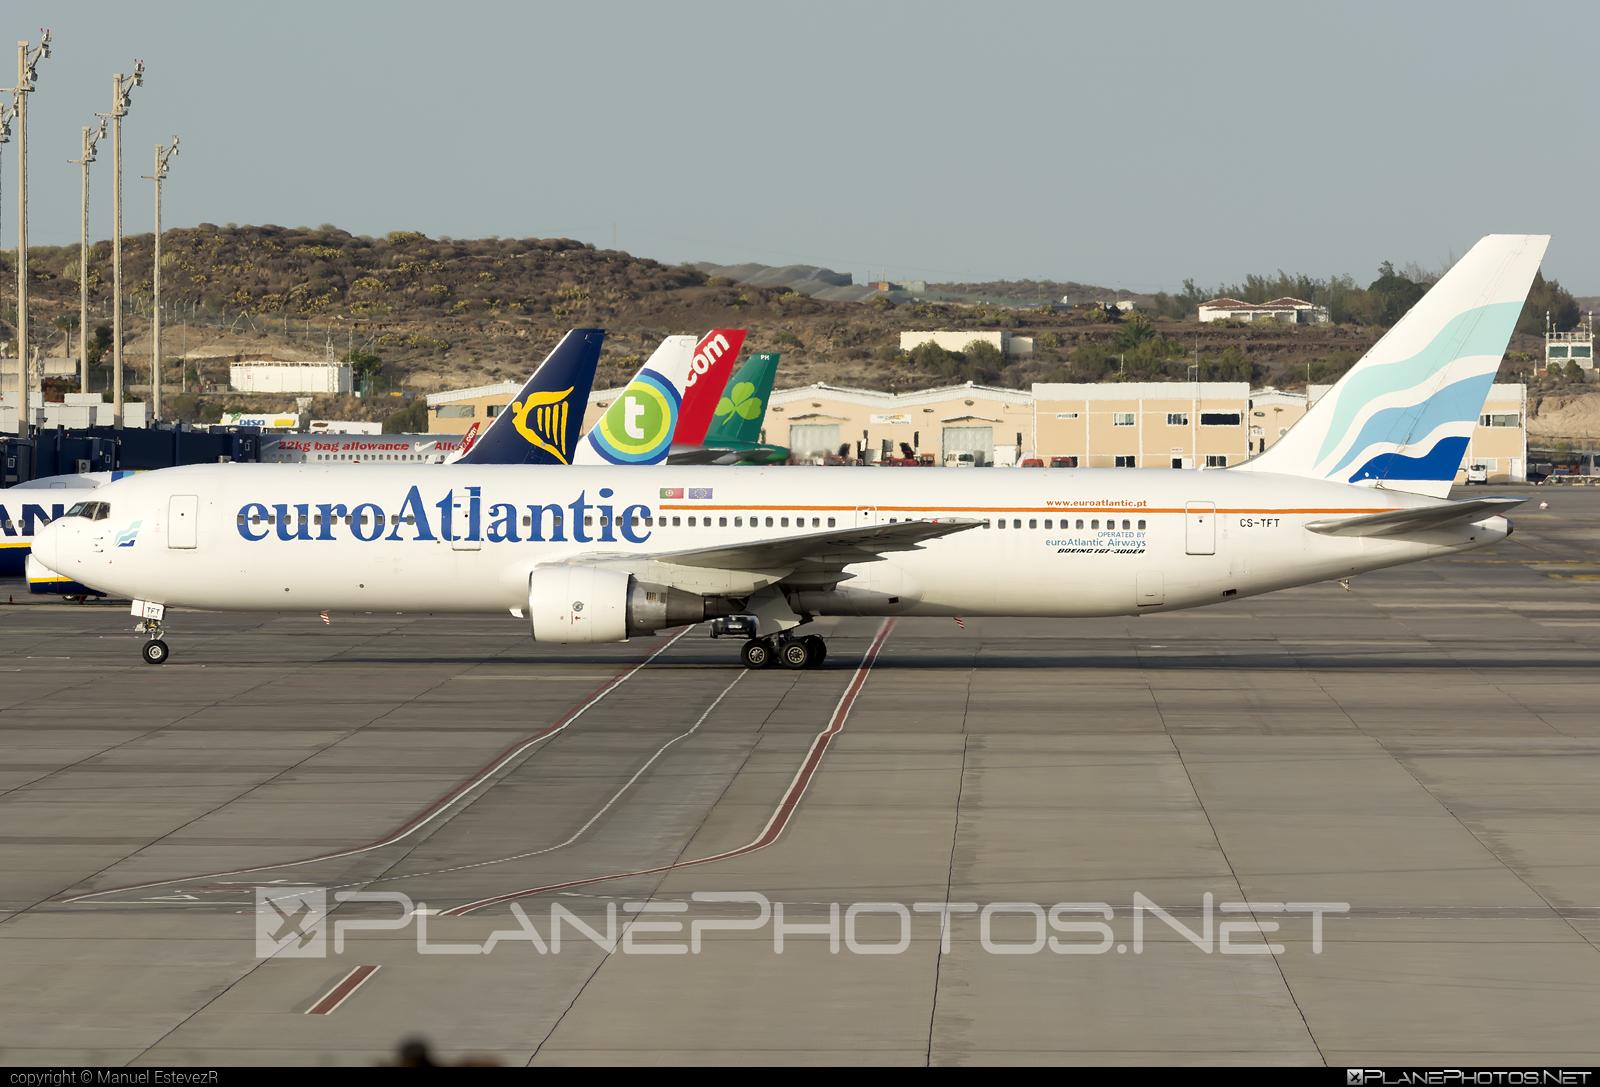 Boeing 767-300ER - CS-TFT operated by euroAtlantic Airways #b767 #b767er #boeing #boeing767 #euroatlantic #euroatlanticairways